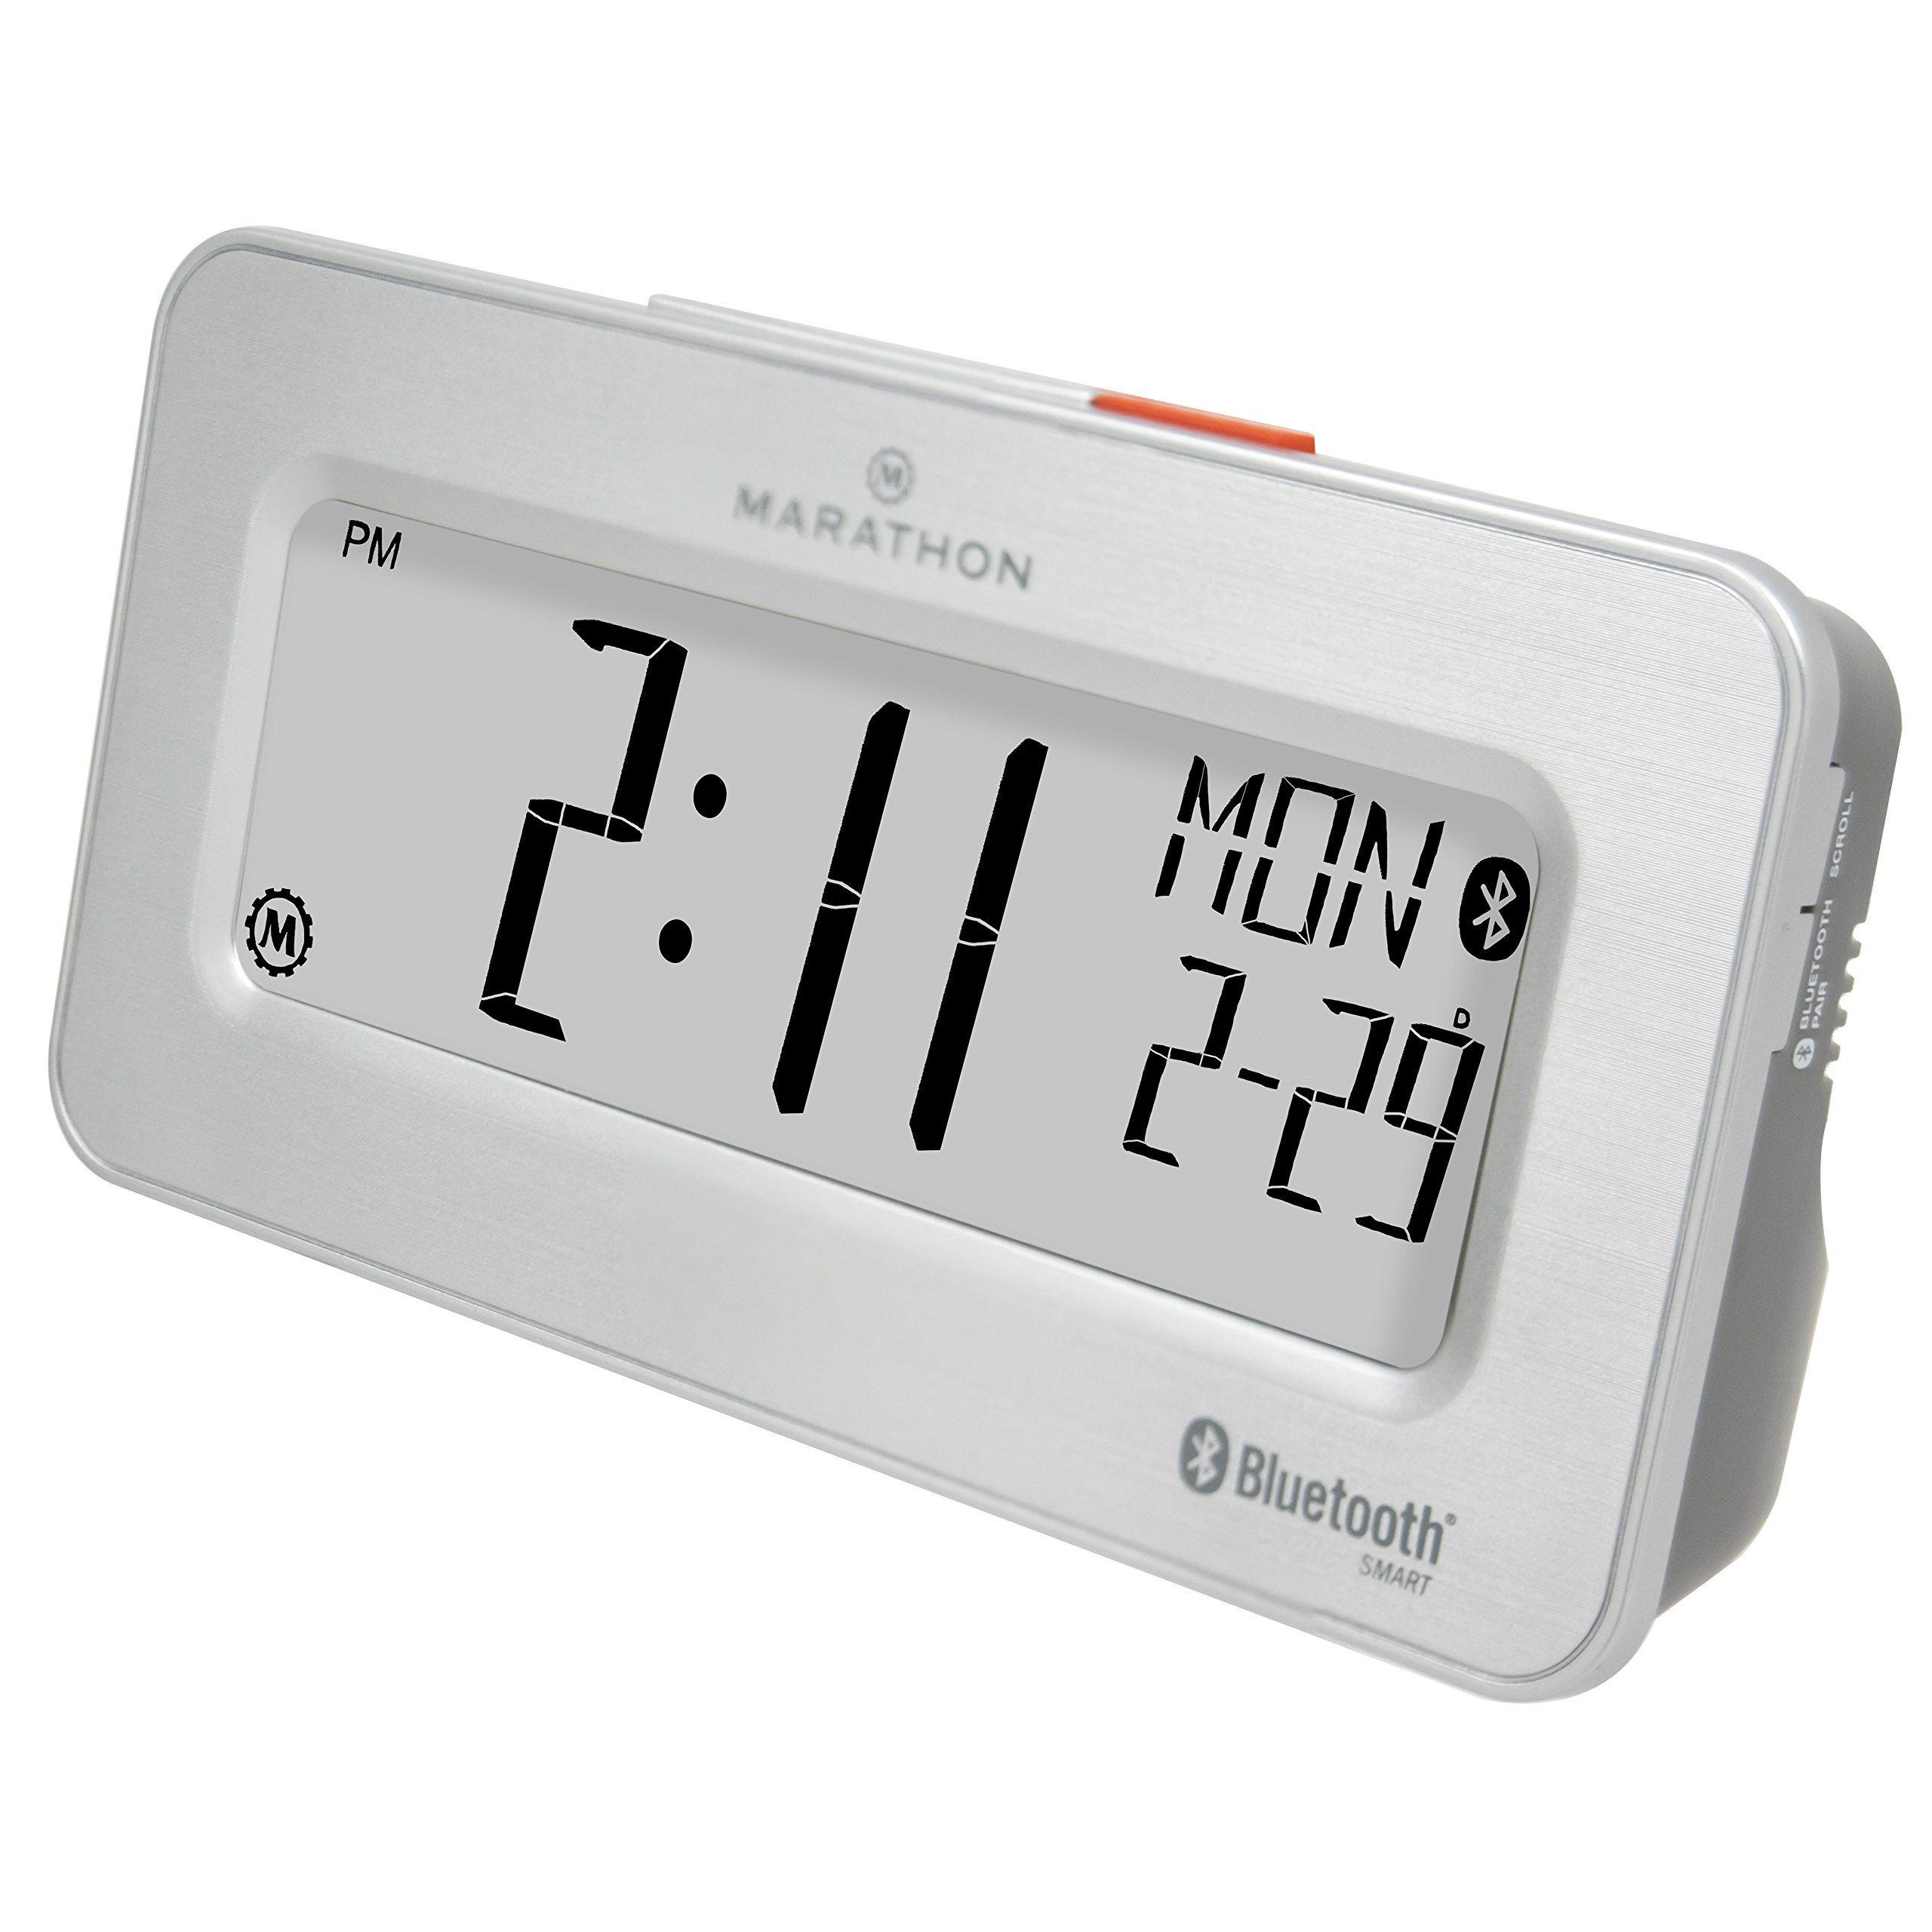 ebaec5586be8898e88fee63a8d3c9139 - Better Homes & Gardens Digital Atomic Clock